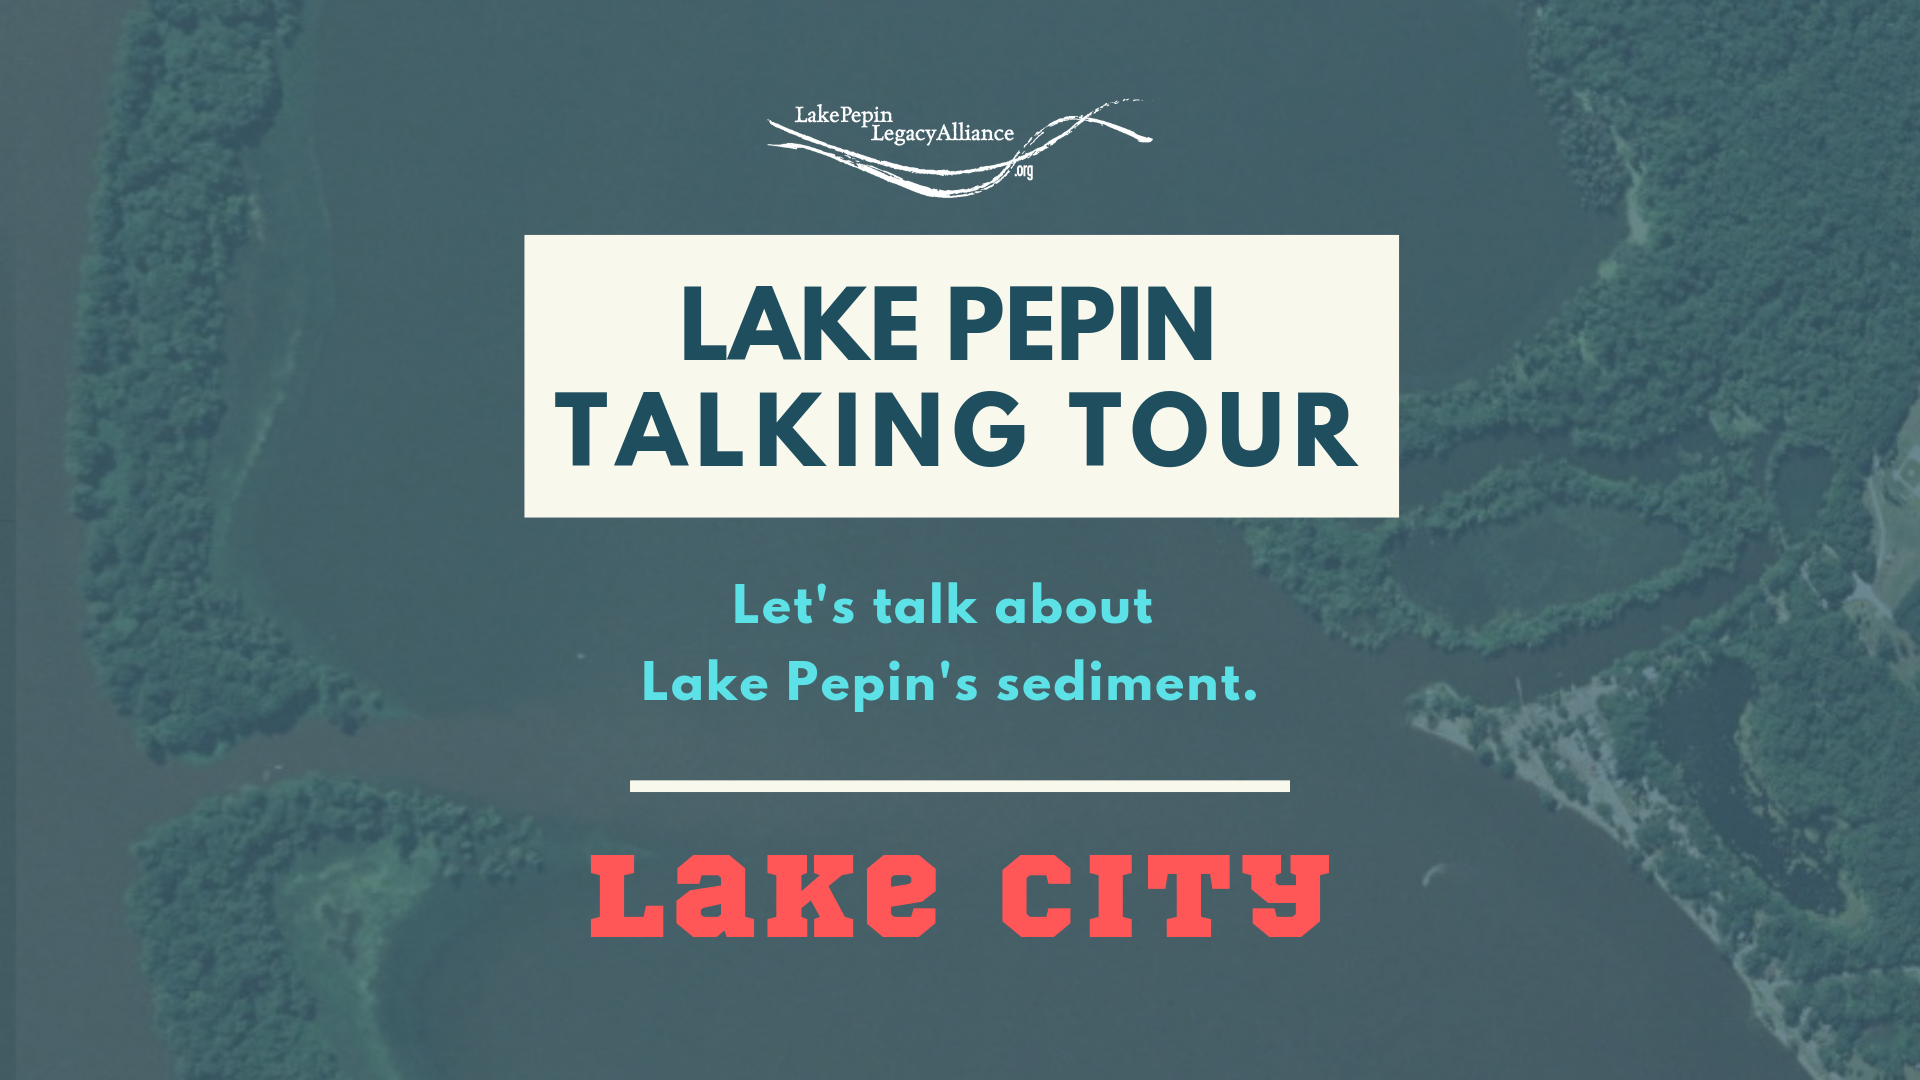 LAKE CITY Talking Tour FB Covers.png